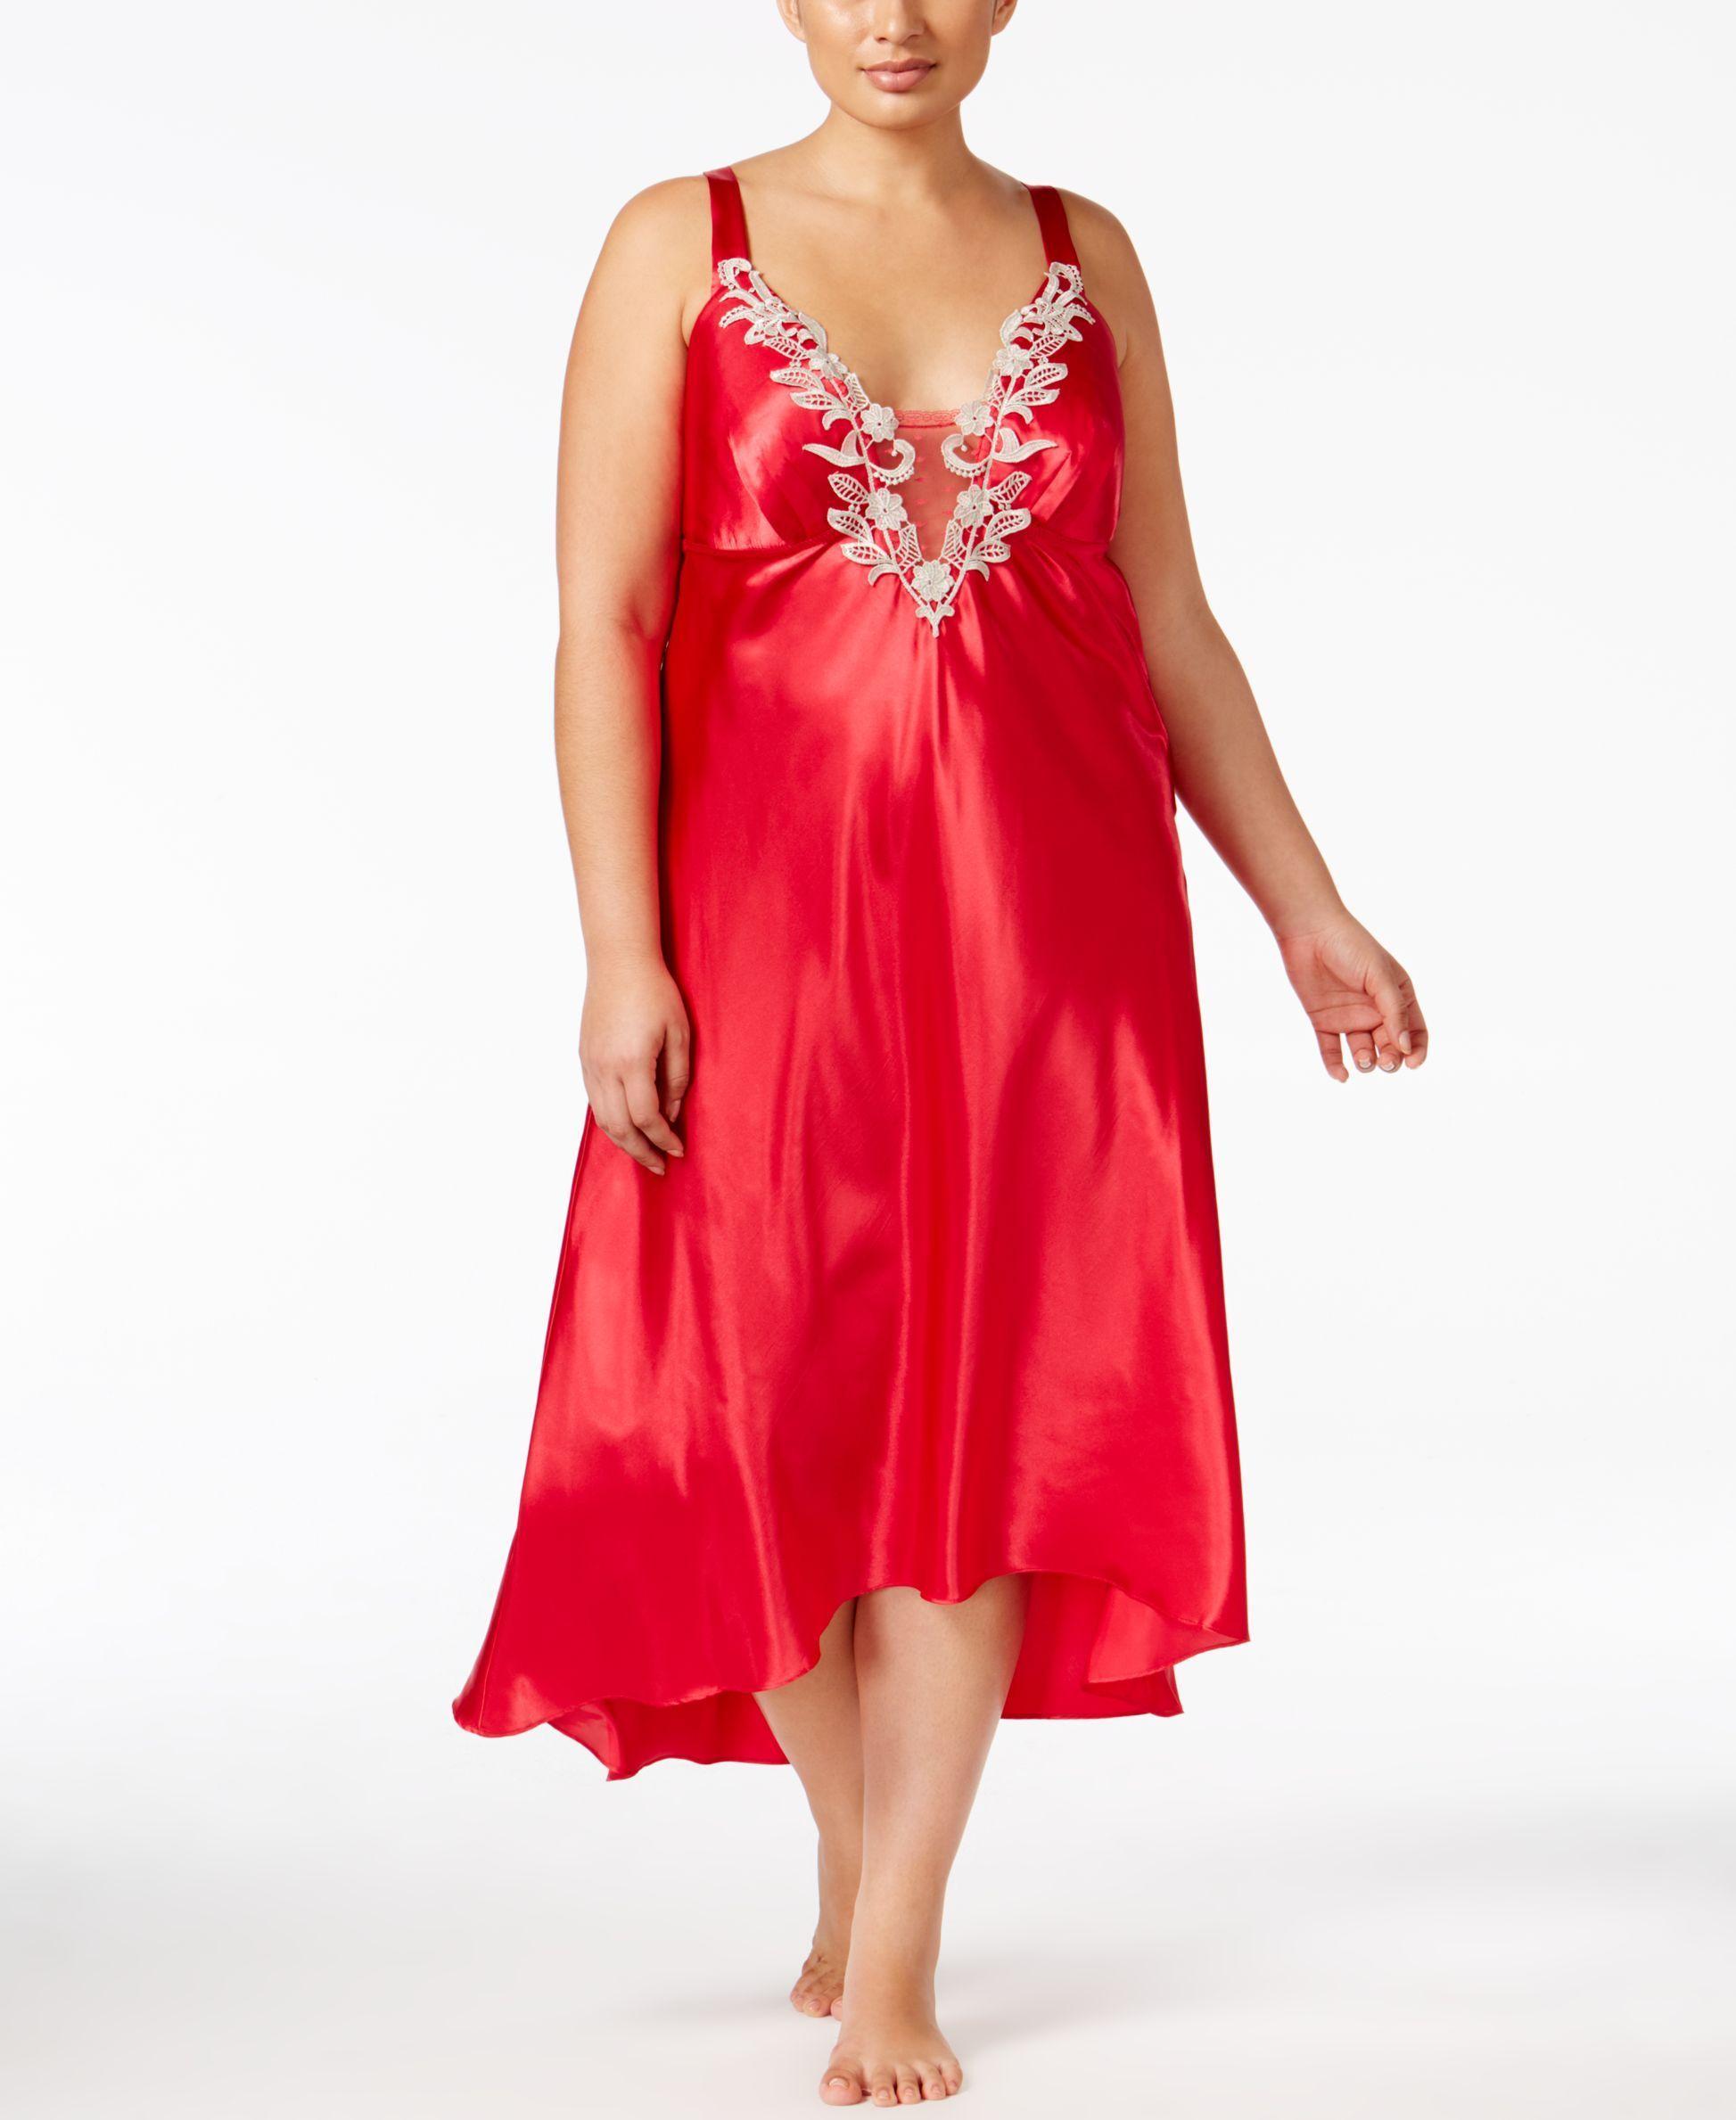 Flora by Flora Nikrooz Plus Size Satin Stella Nightgown | Plus Size ...